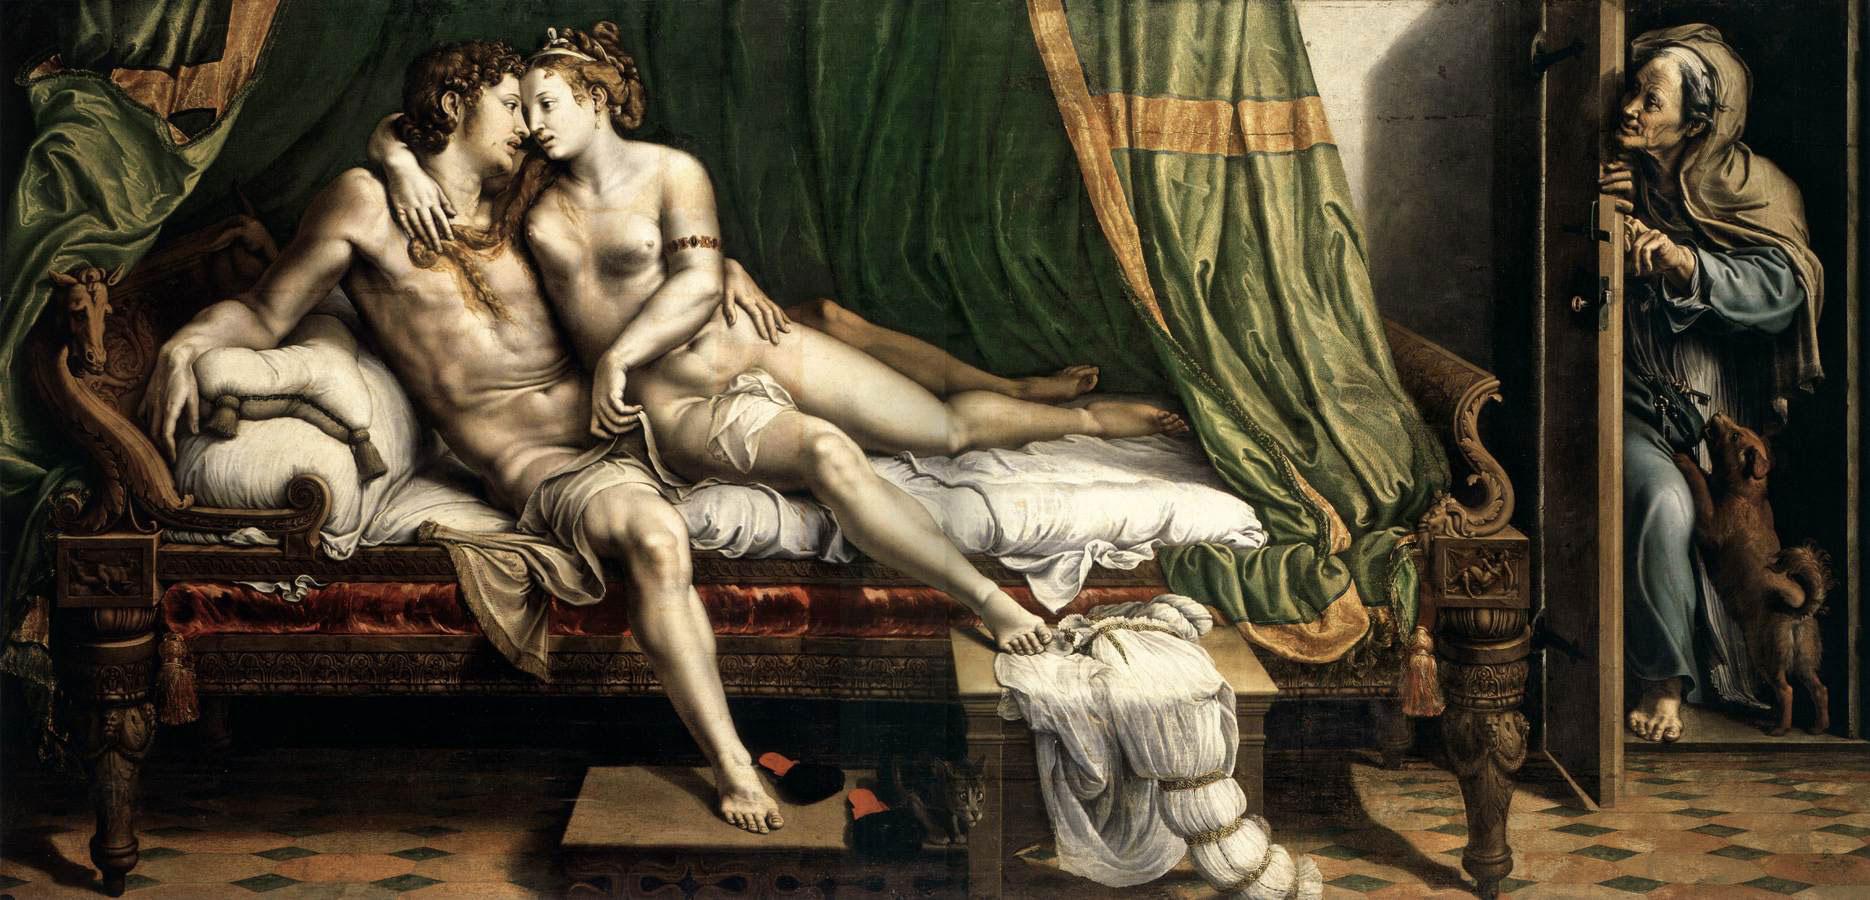 Giulio Romano, Due amanti (1524 circa; olio su tavola trasferito su tela; 163 x 337 cm; San Pietroburgo, Ermitage)